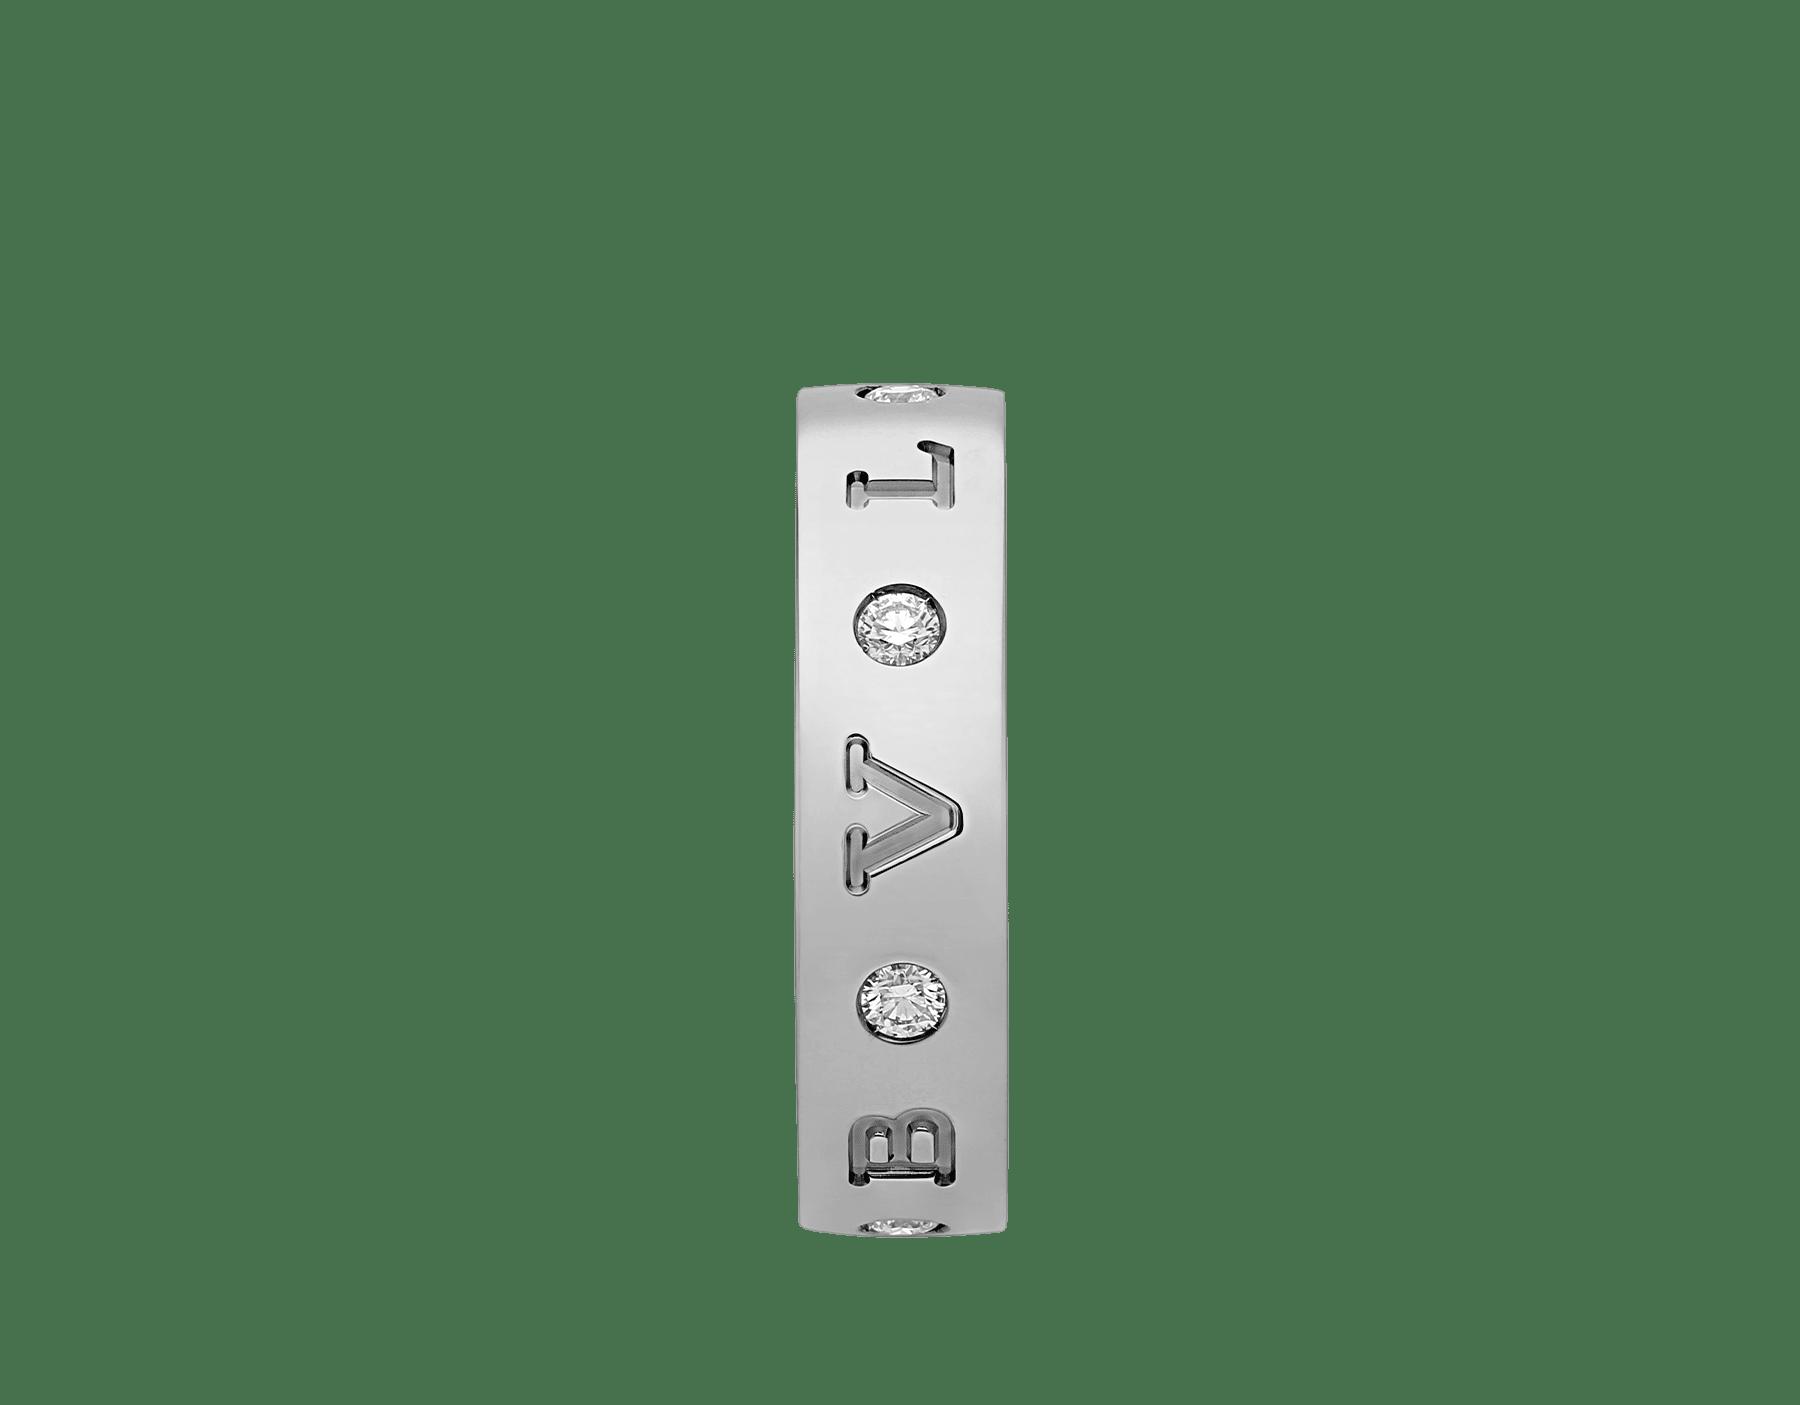 Anillo BVLGARI BVLGARI en oro blanco de 18 qt con siete diamantes engastados (0,20ct). AN858097 image 2